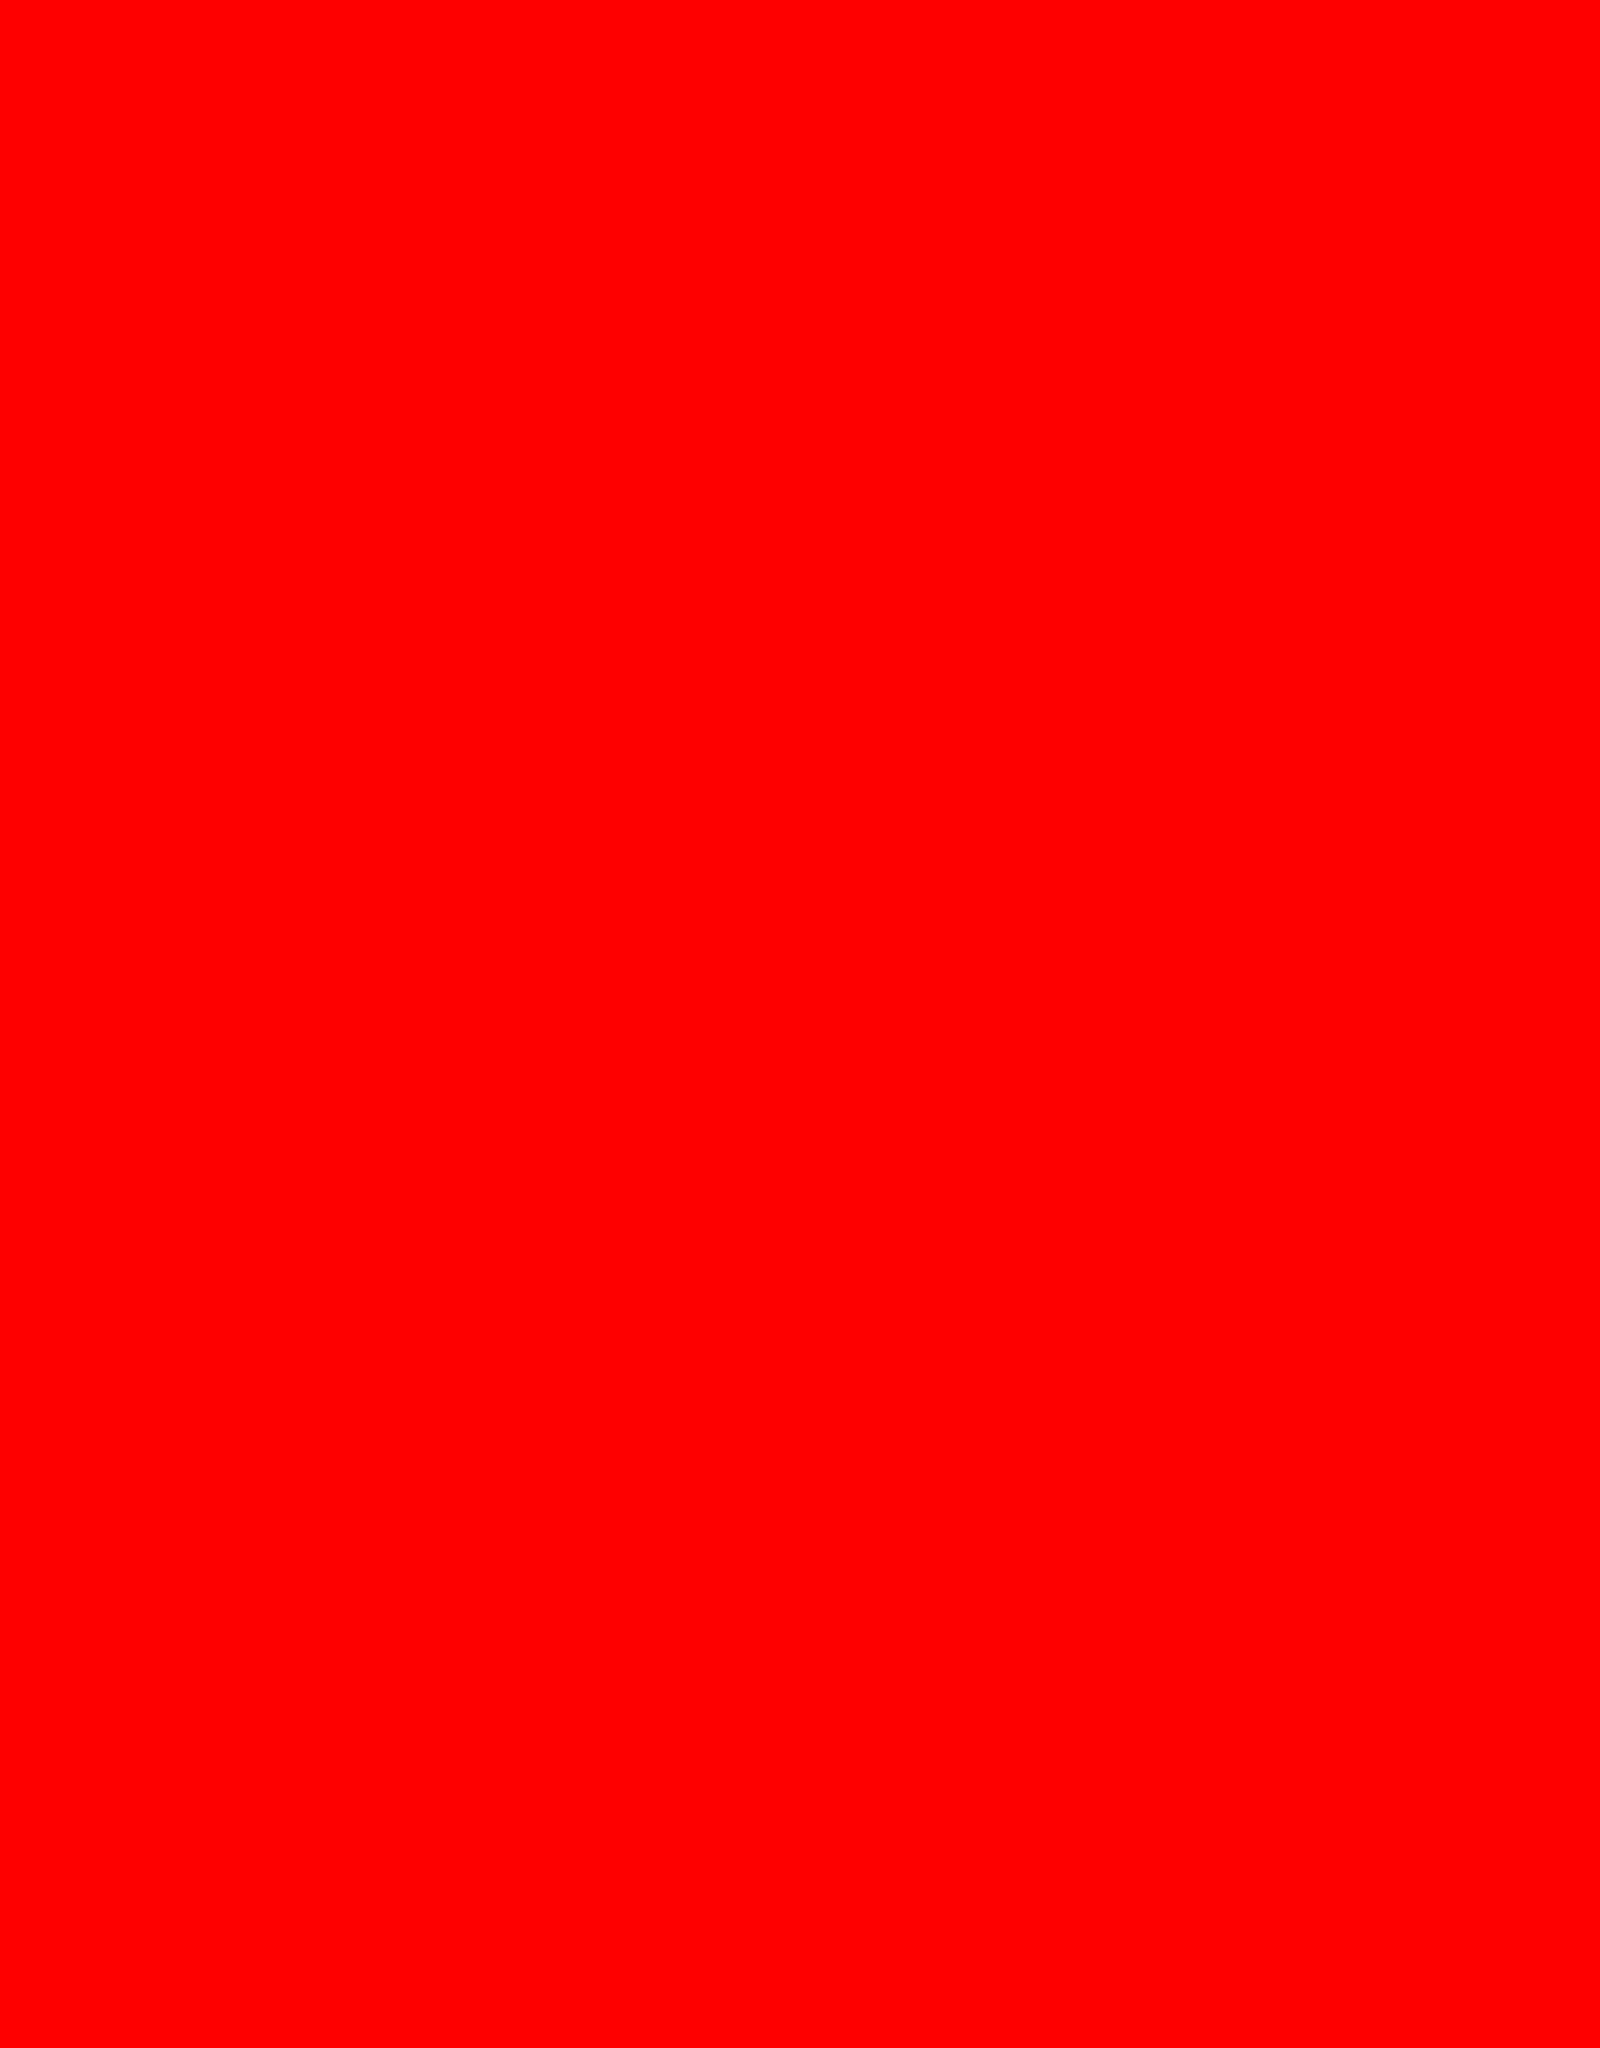 Drimarene K Scarlet